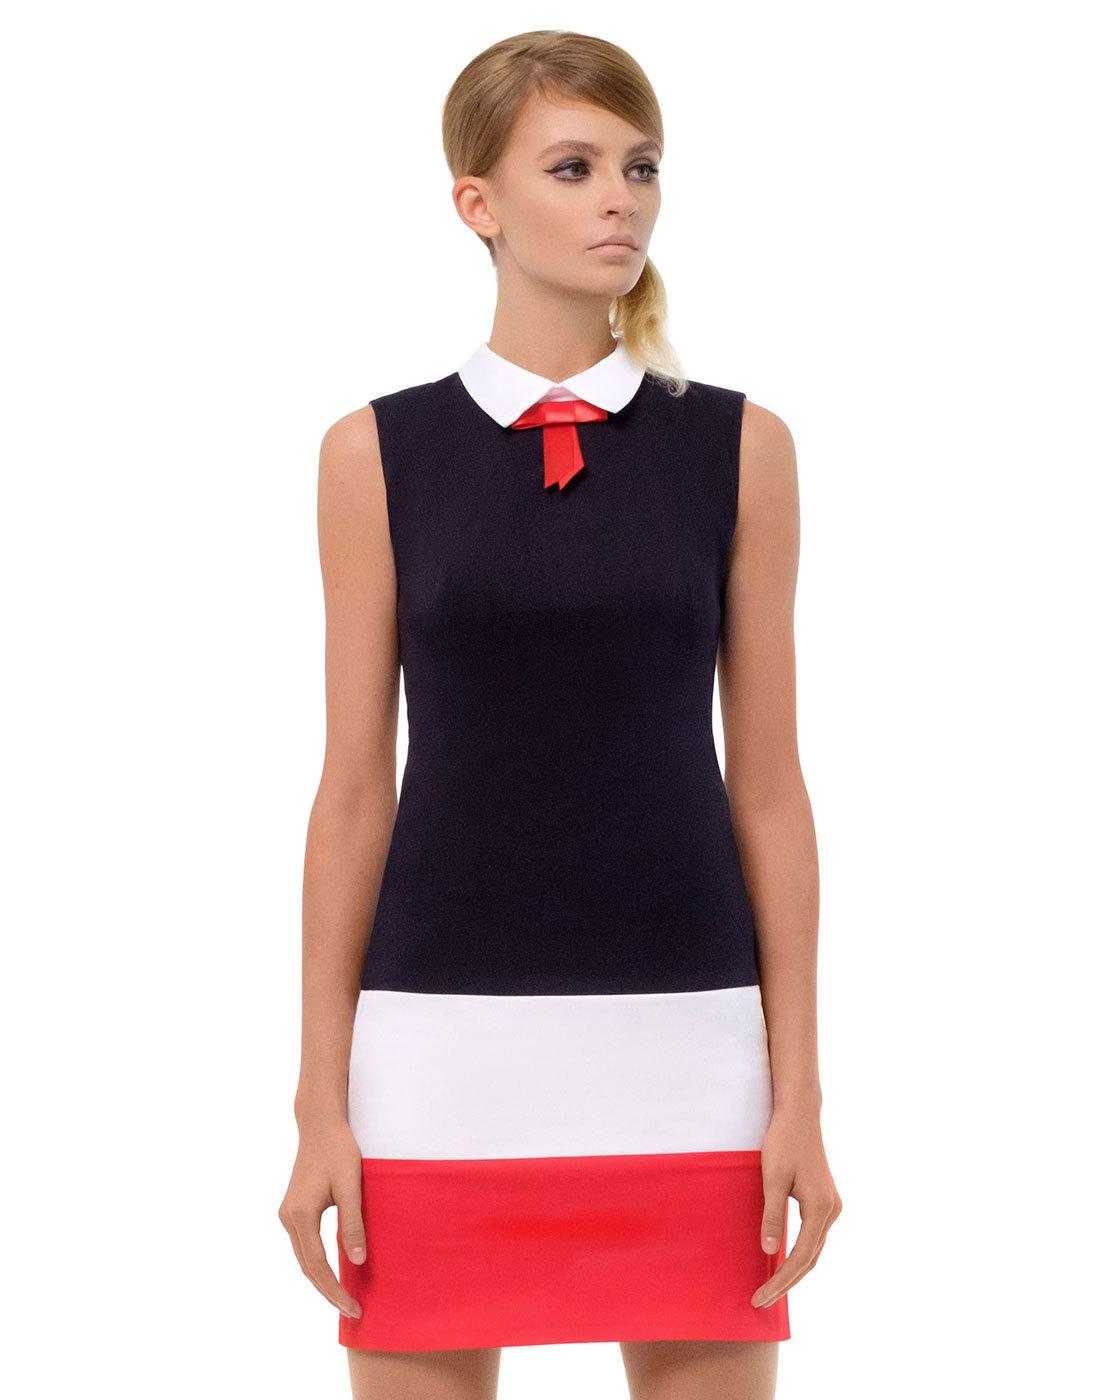 MARMALADE Retro 60s Bow Collar Mod Mini Dress